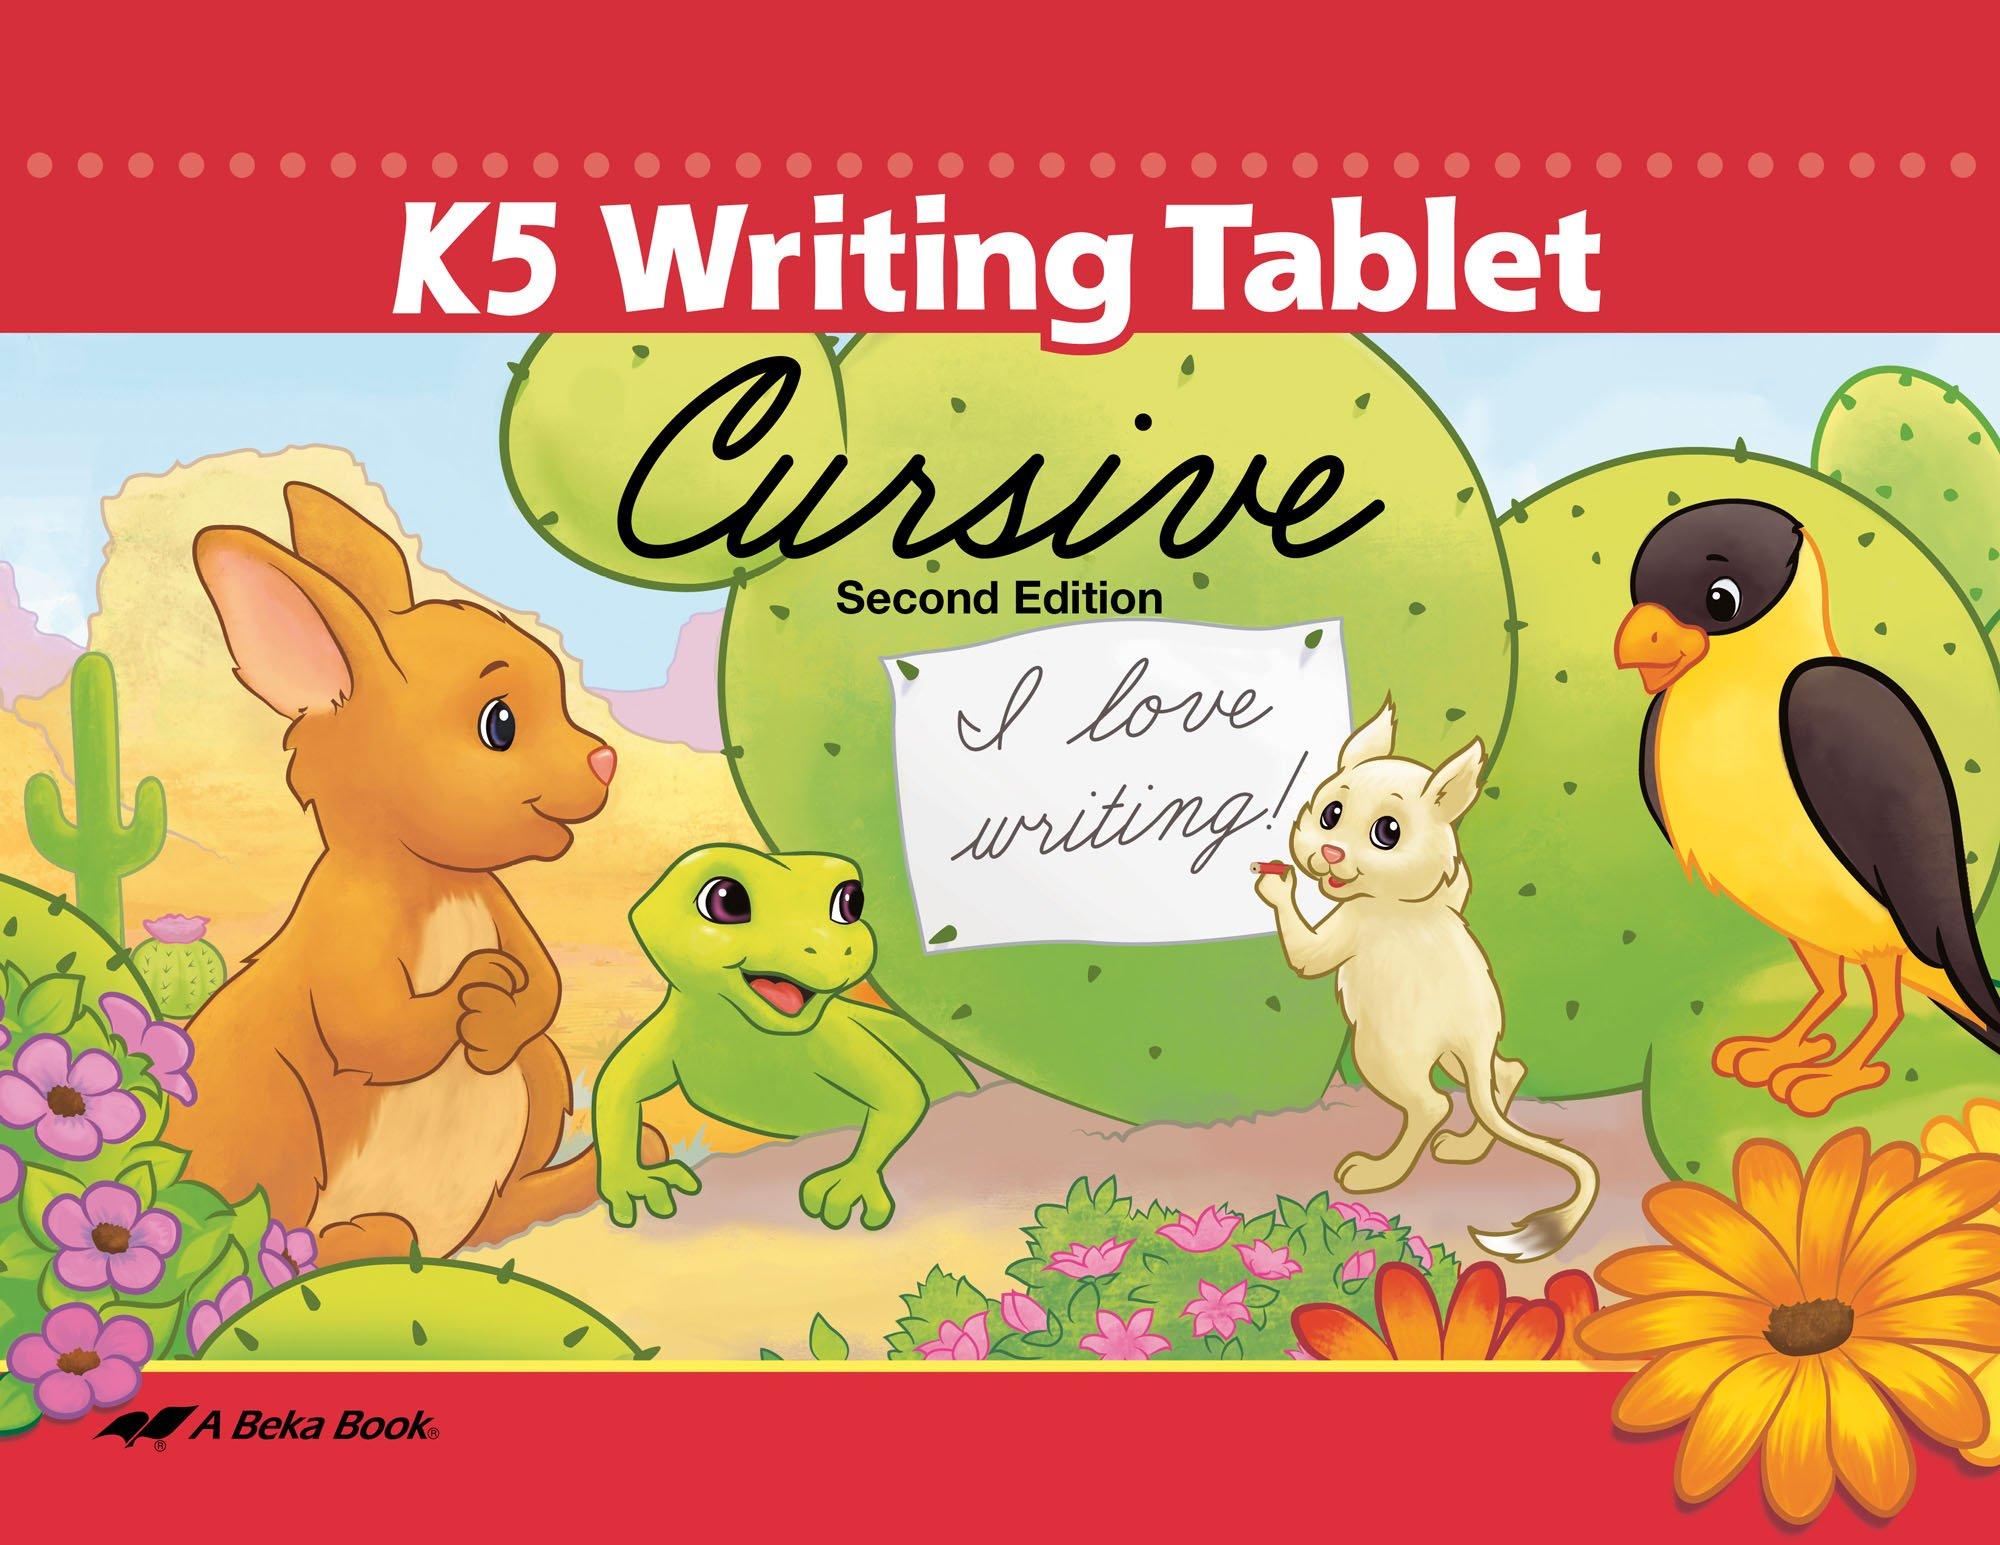 K5 Writing Tablet Cursive